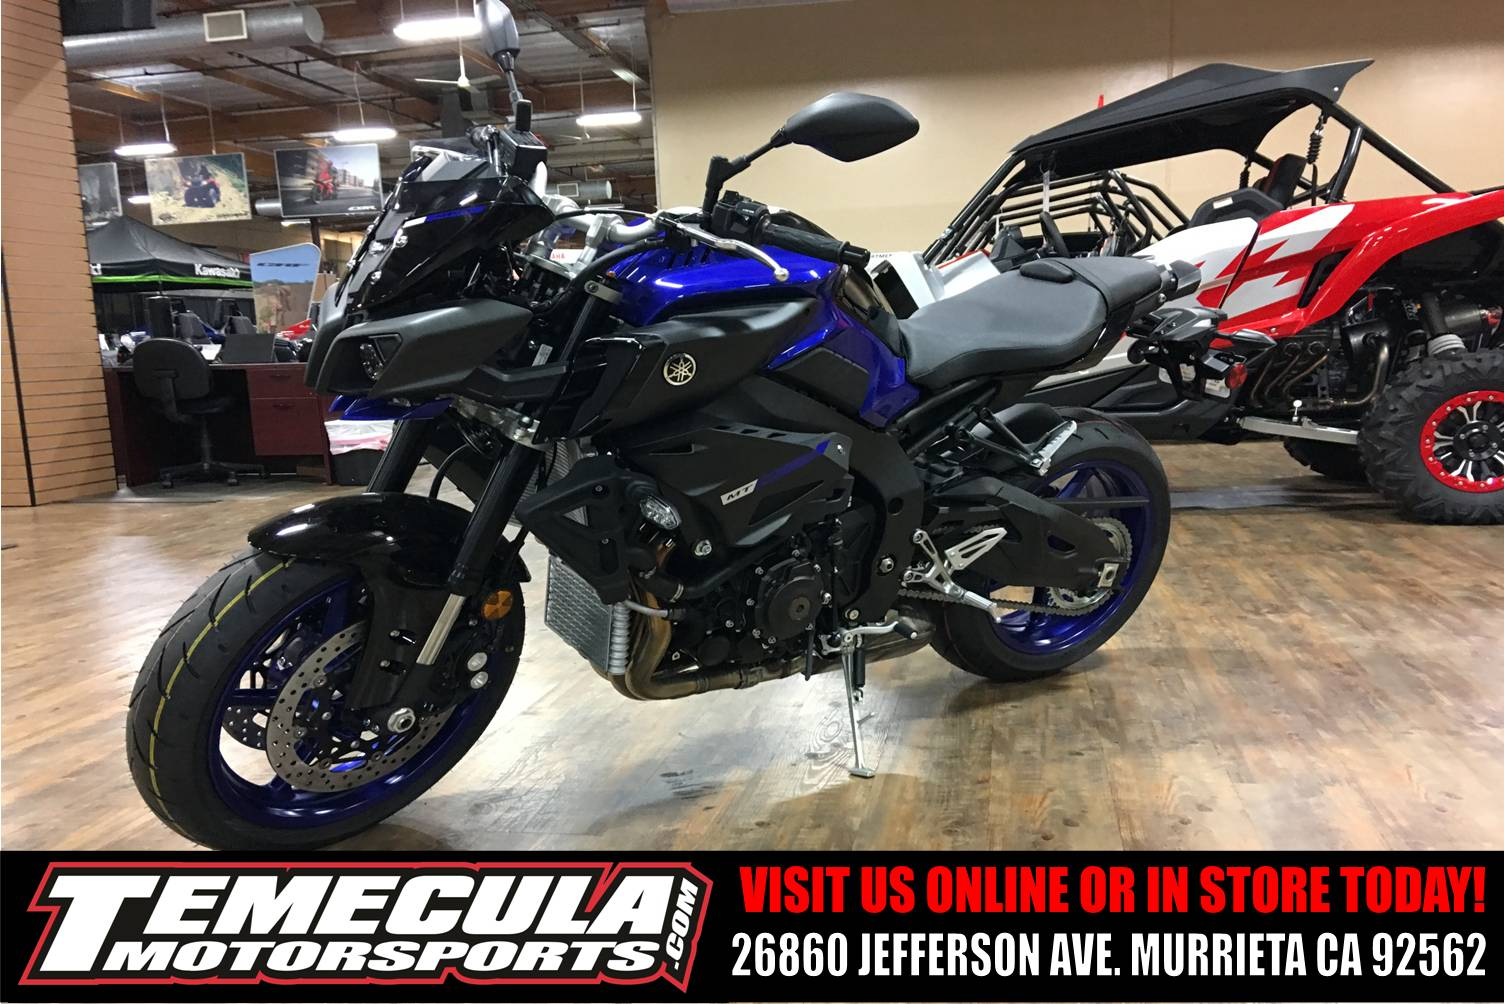 New 2018 yamaha mt 10 motorcycles in murrieta ca stock for Yamaha mt10 price